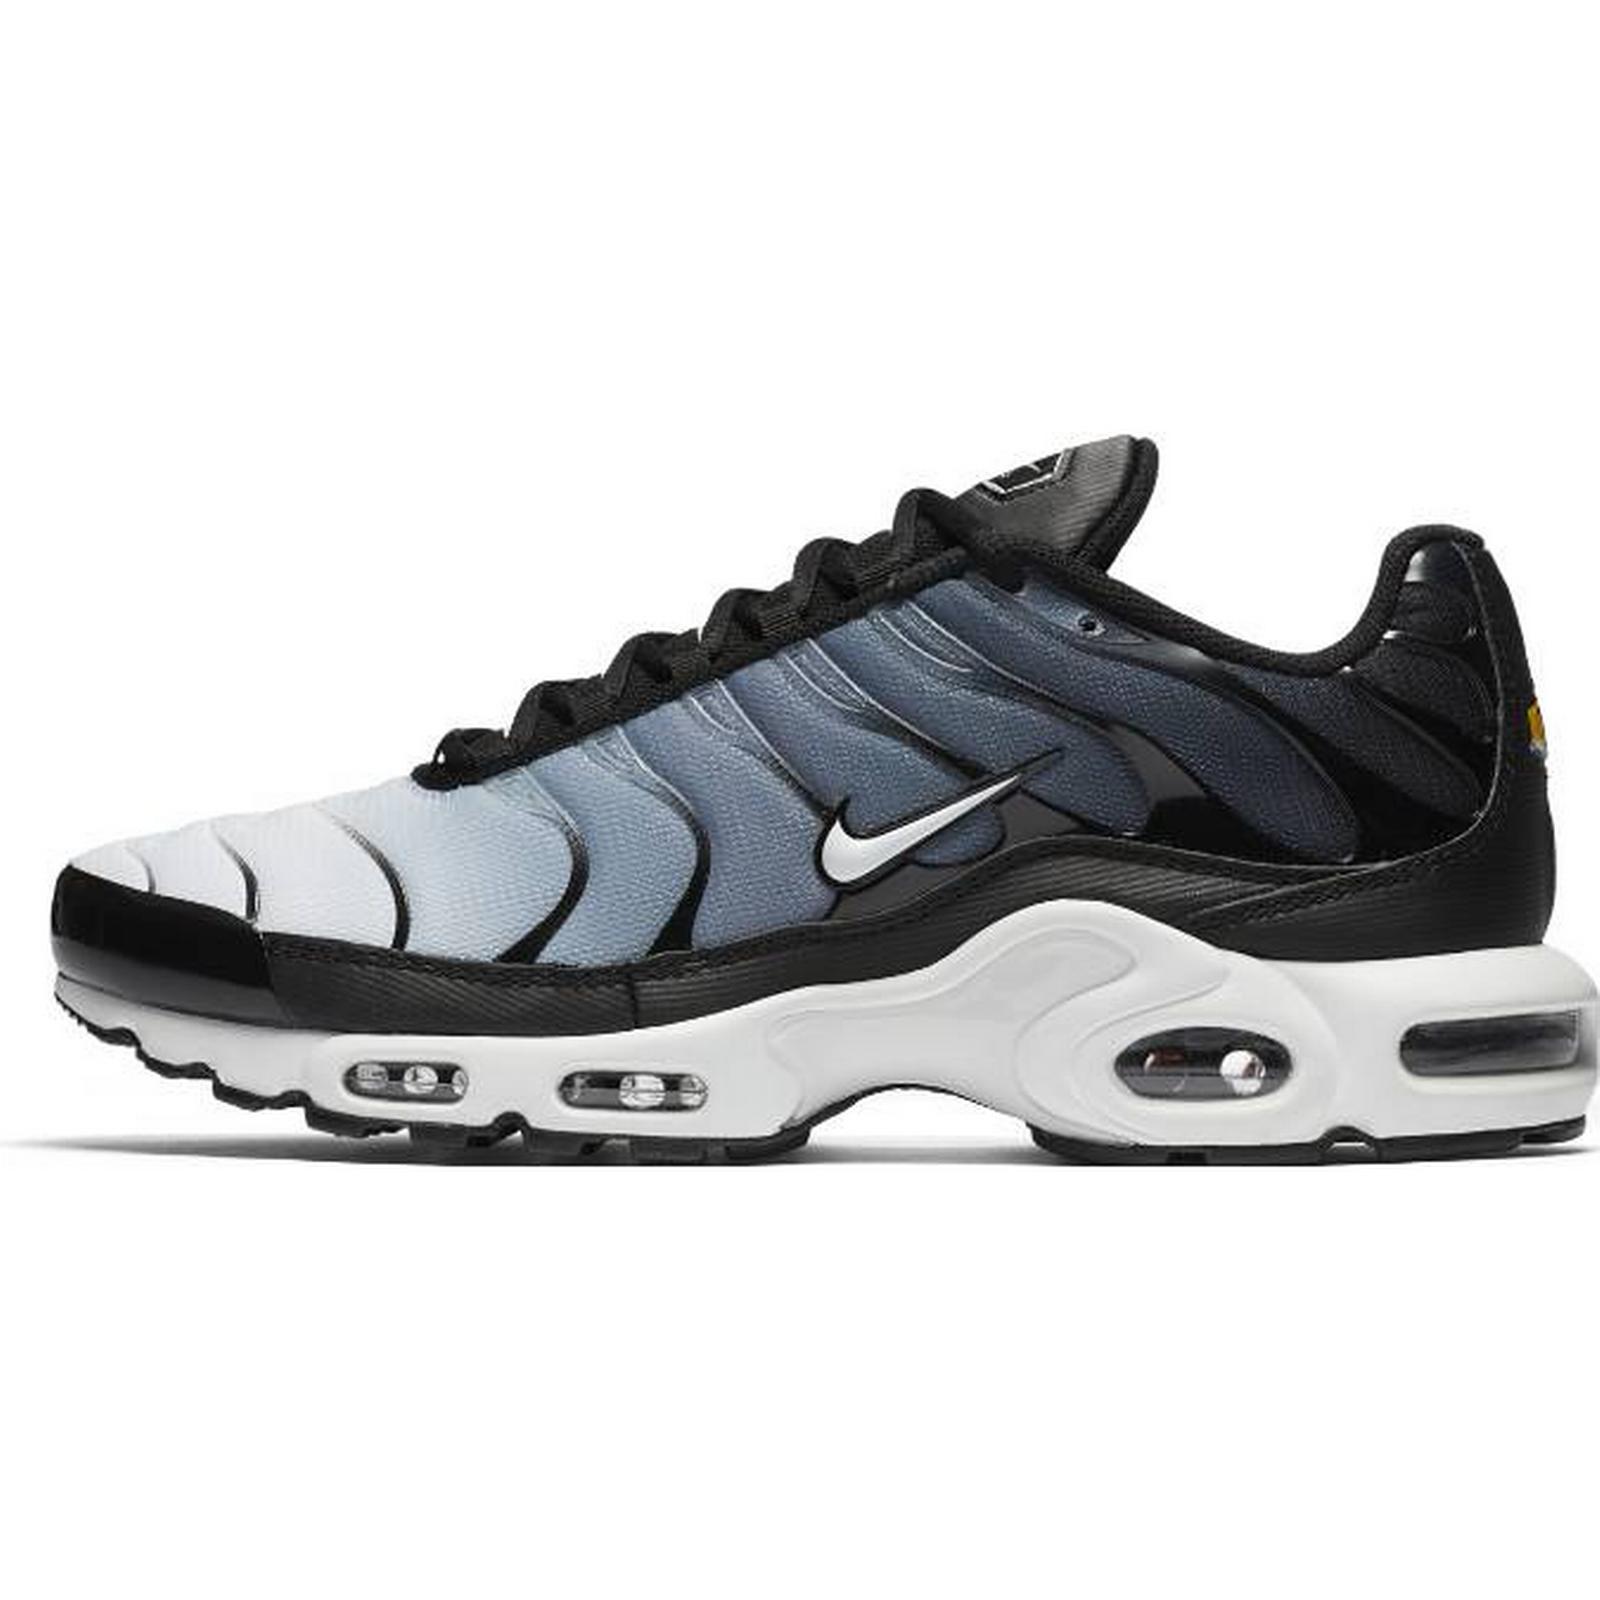 Man's/Woman's : NIKE Buty Plus Męskie Nike Air Max Plus Buty : Low cost 504d30